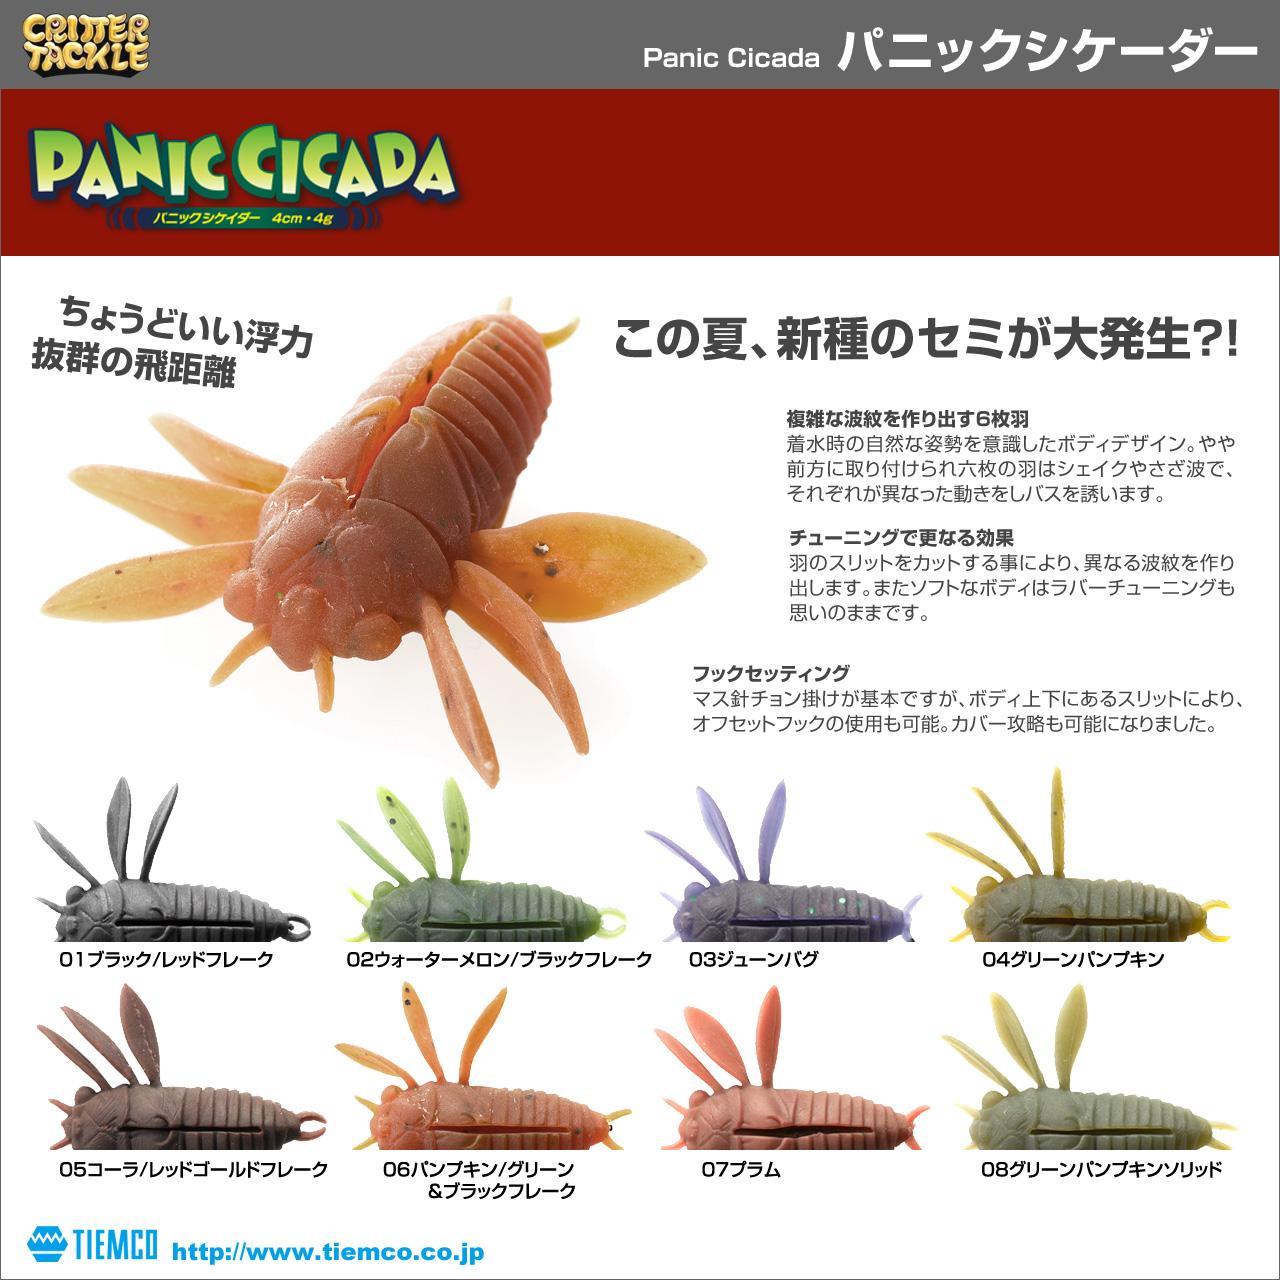 Tiemco Panic Cicada